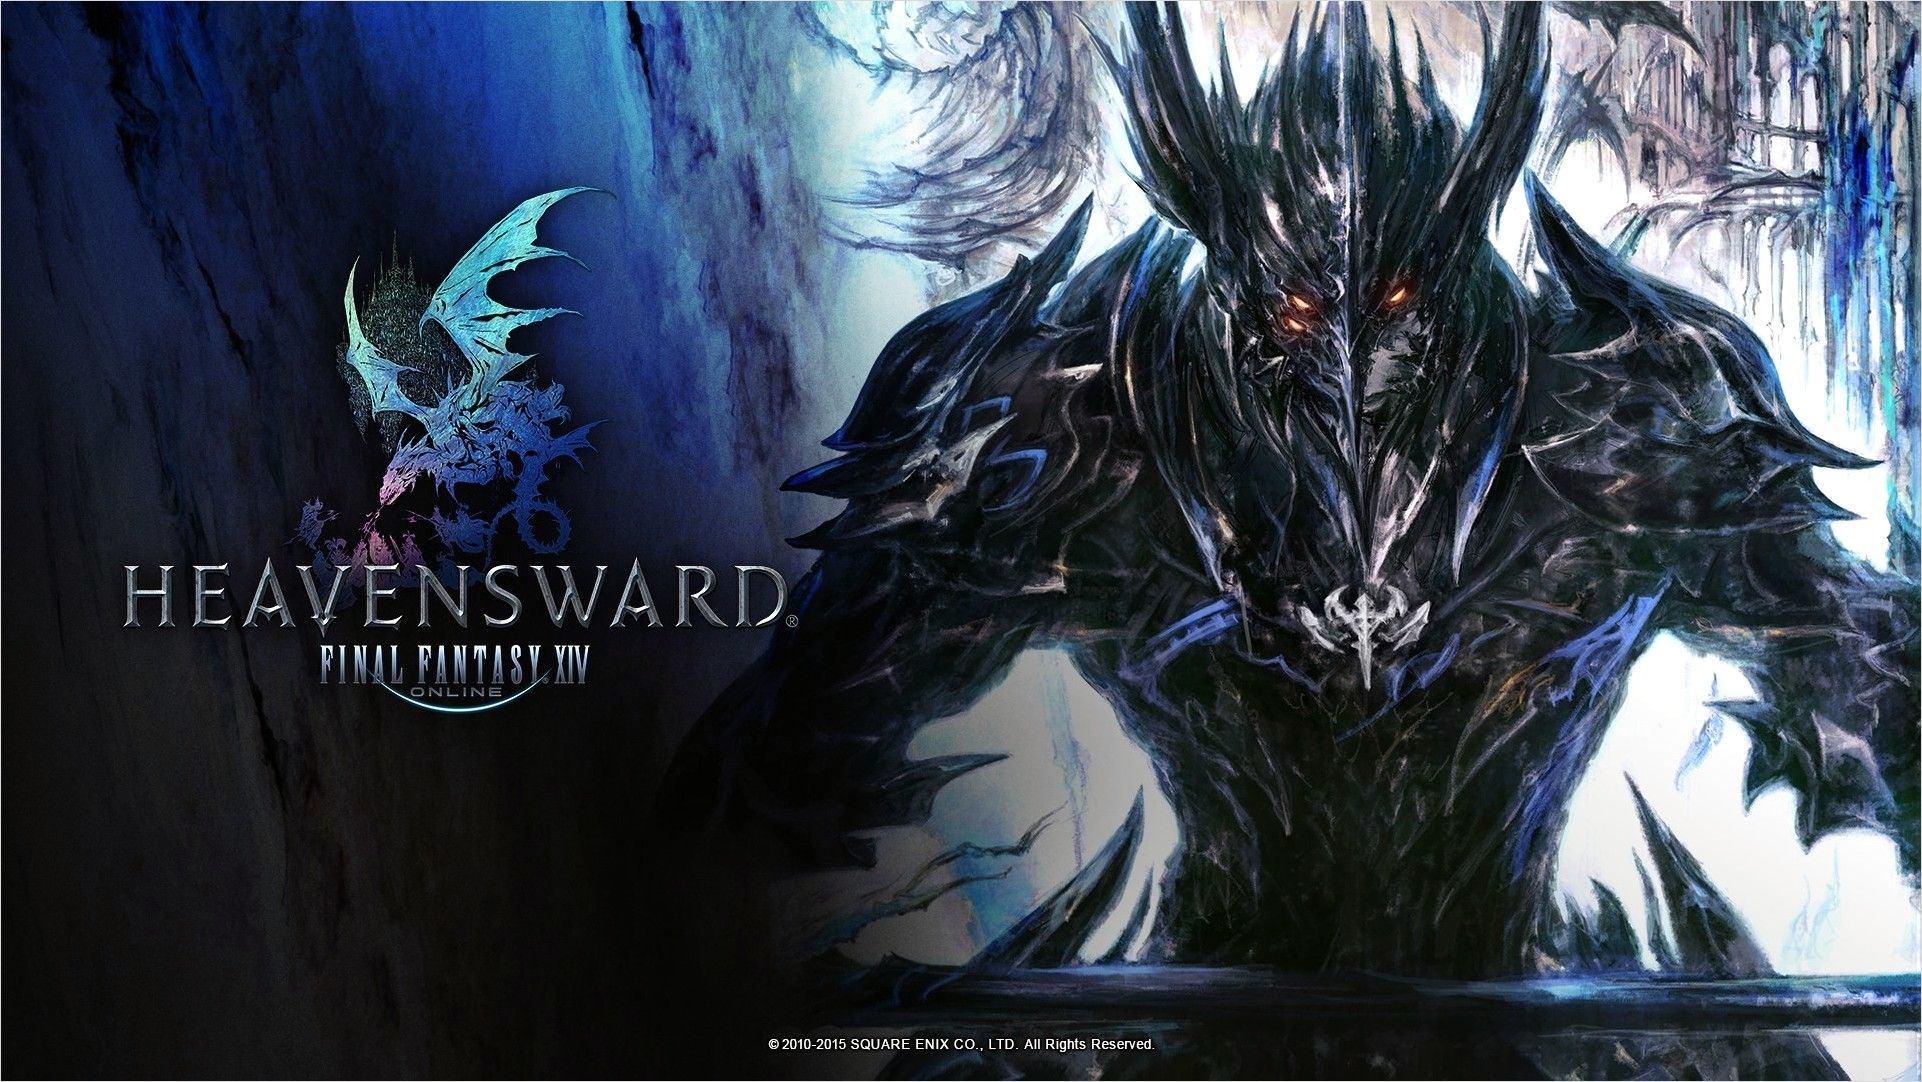 4k Blue Wallpaper Ffxiv In 2020 Blue Wallpapers Dark Knight Wallpaper Final Fantasy Xiv